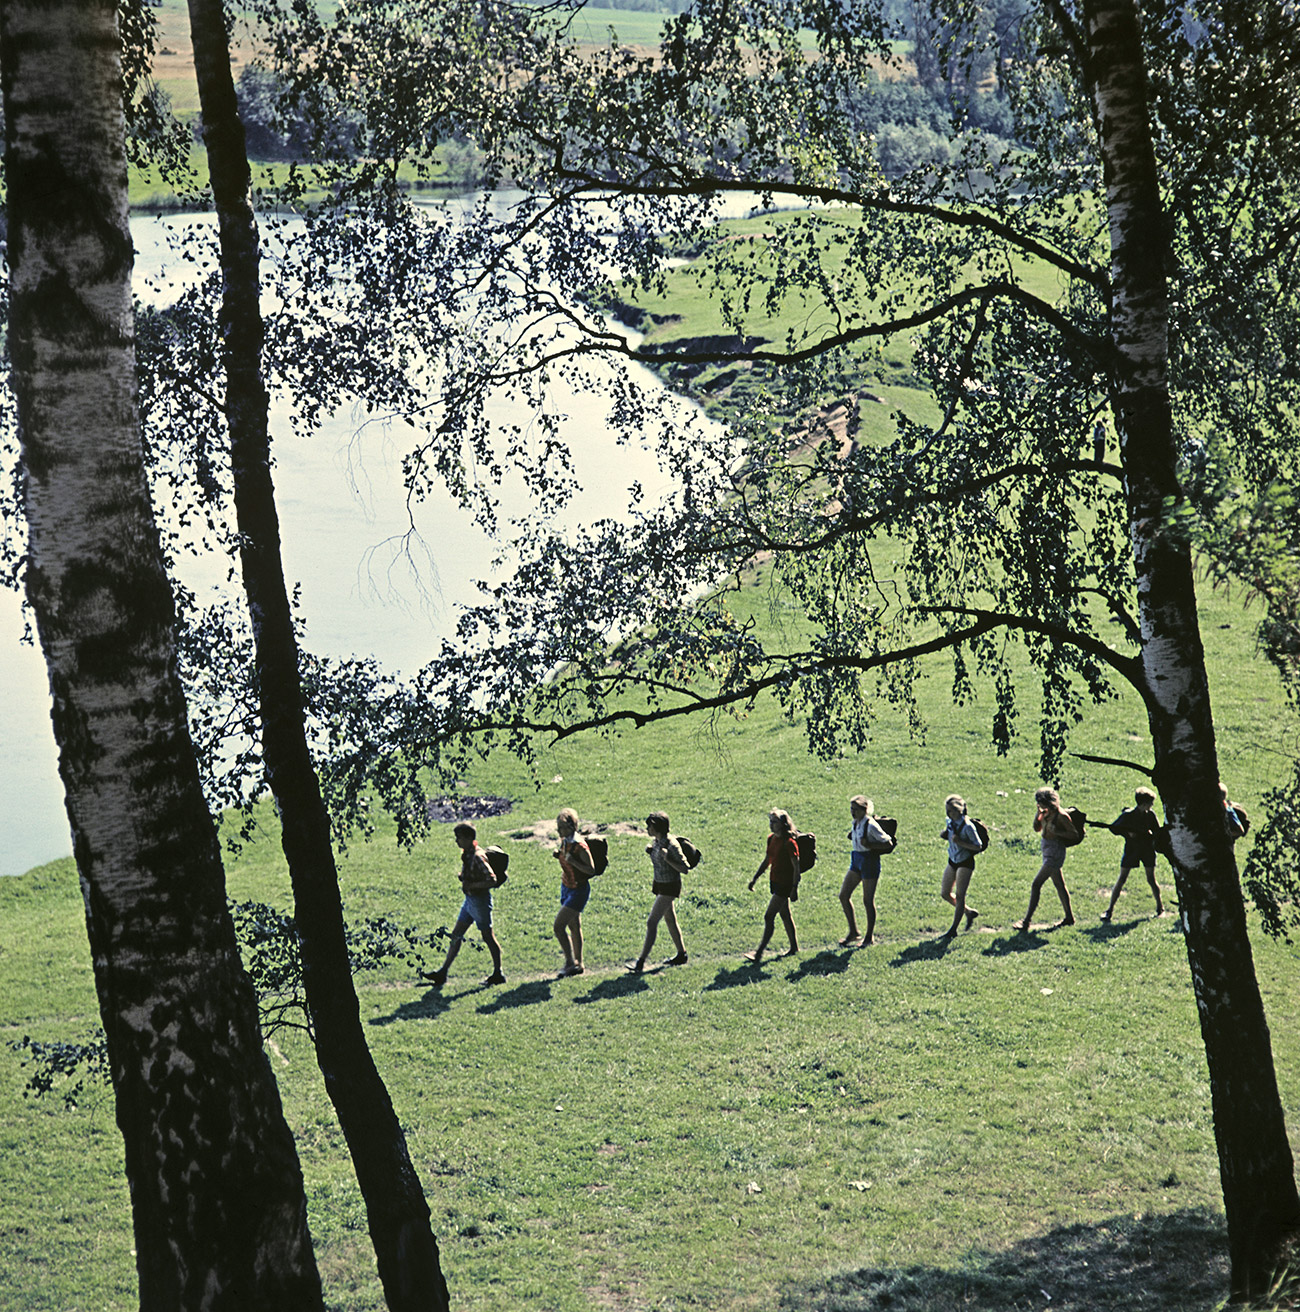 Anak-anak dari Bumi Perkemahan Pionir Pelaut Muda mengikuti kegiatan perkemahan. Sumber: Tihanov/RIA Novosti